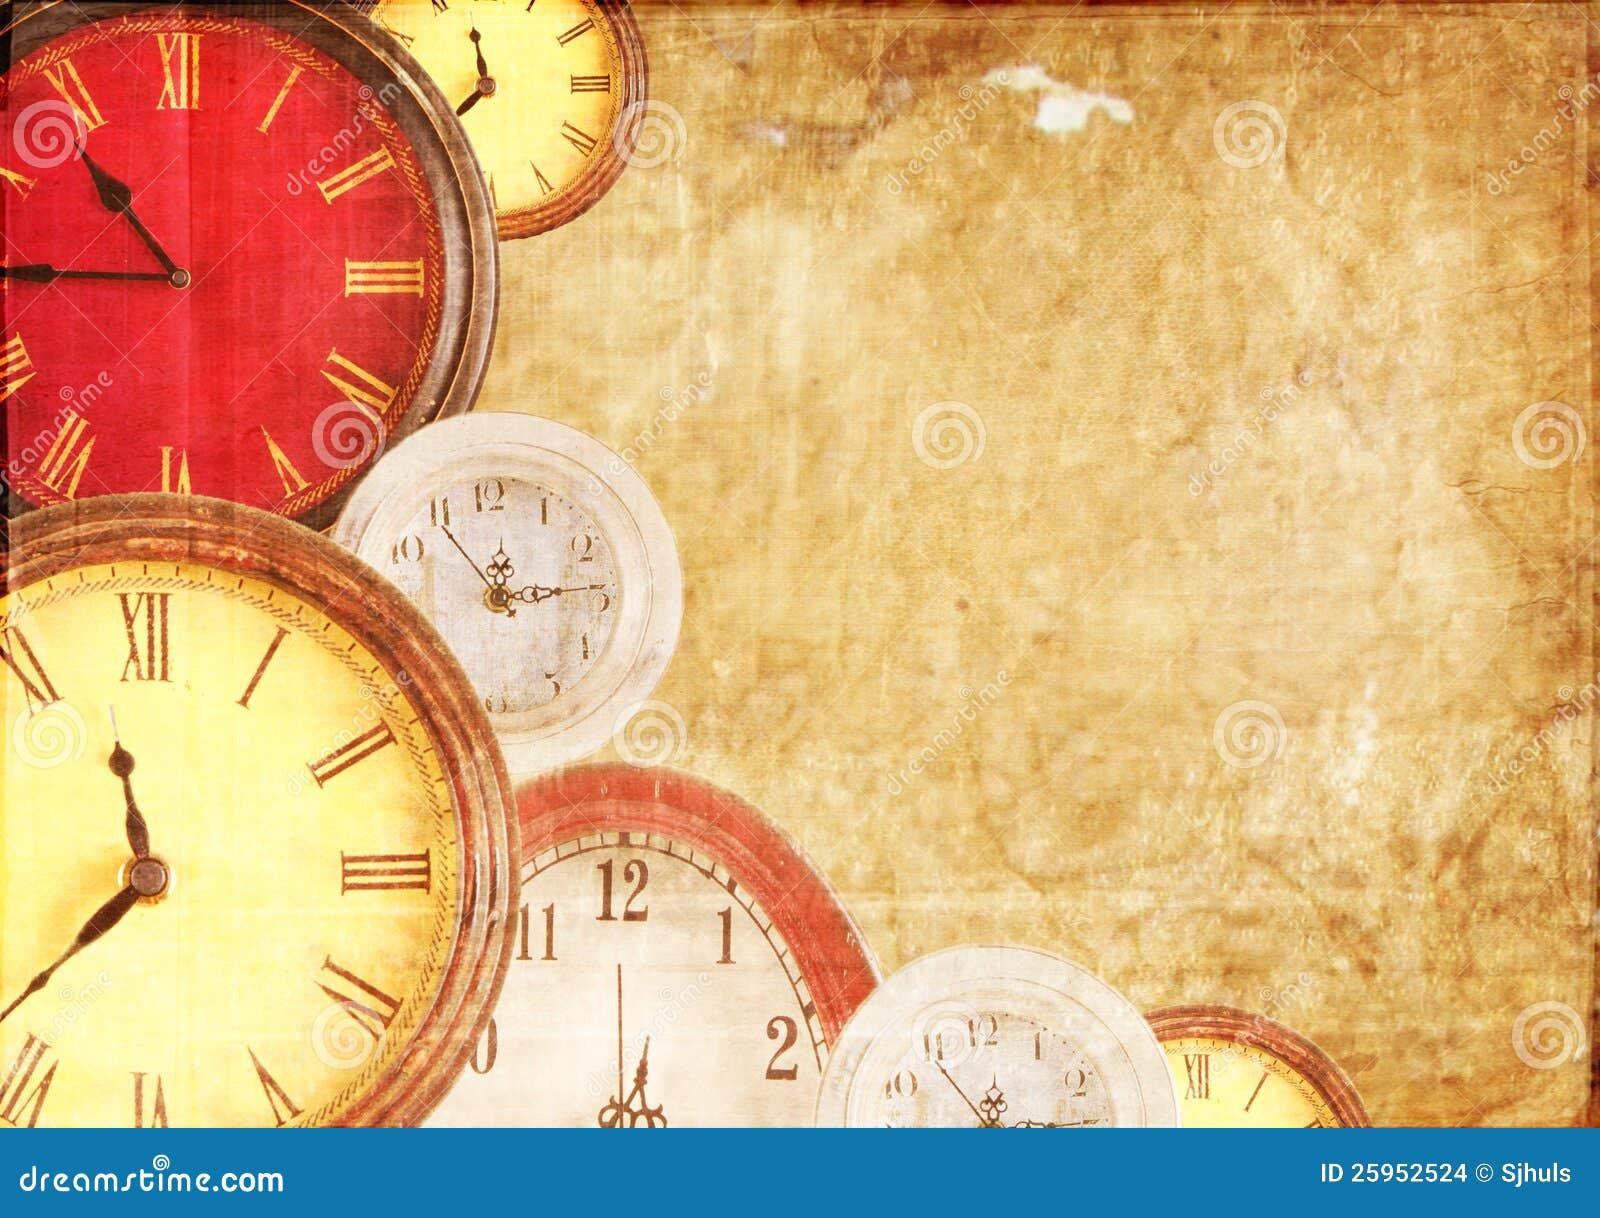 Many Clocks On A Paper Background Stock Photo Image